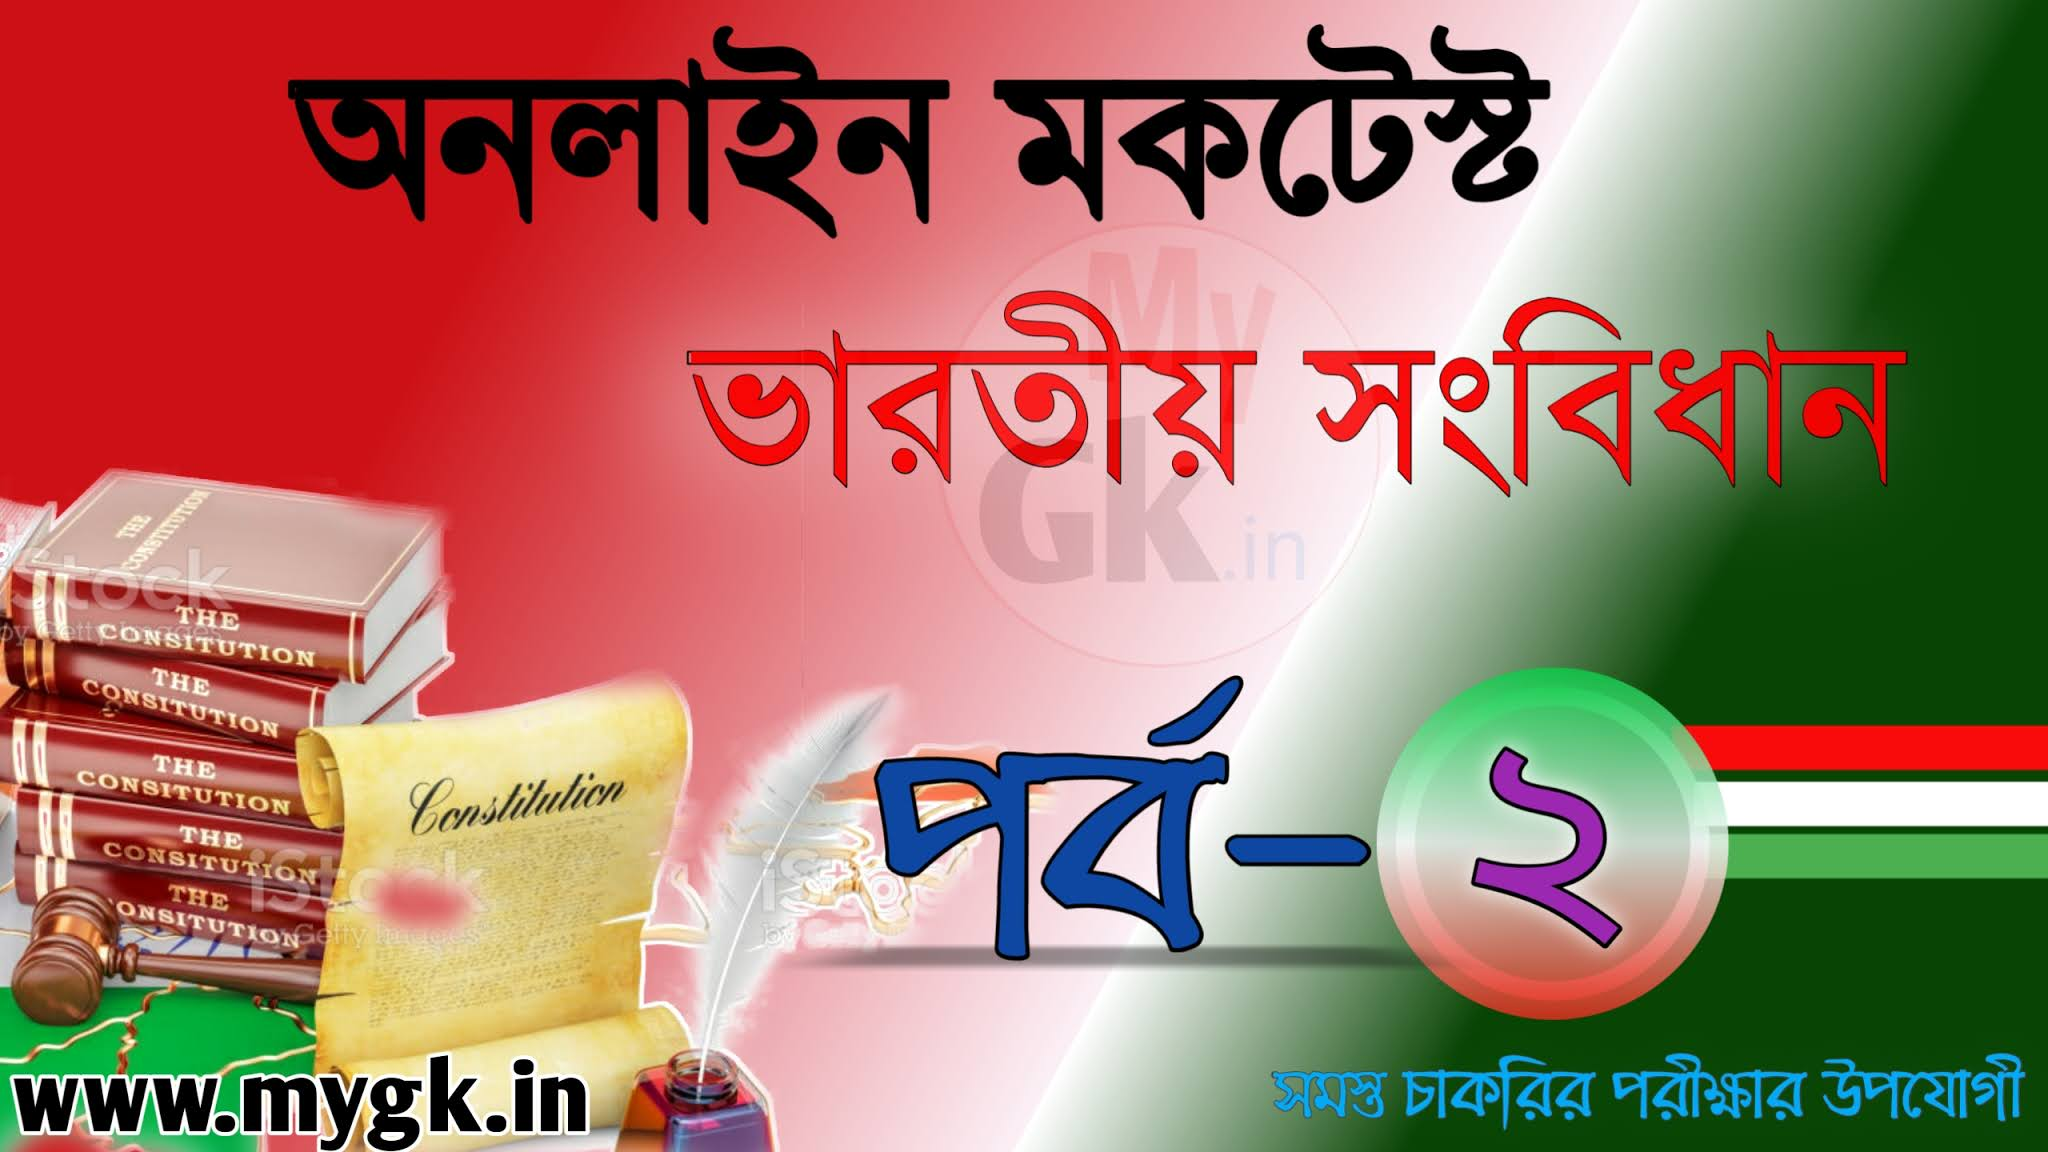 Online Mocktest On Indian Constitution in Bengali For All Competitive Exam    ভারতীয় সংবিধান অনলাইন মকটেস্ট